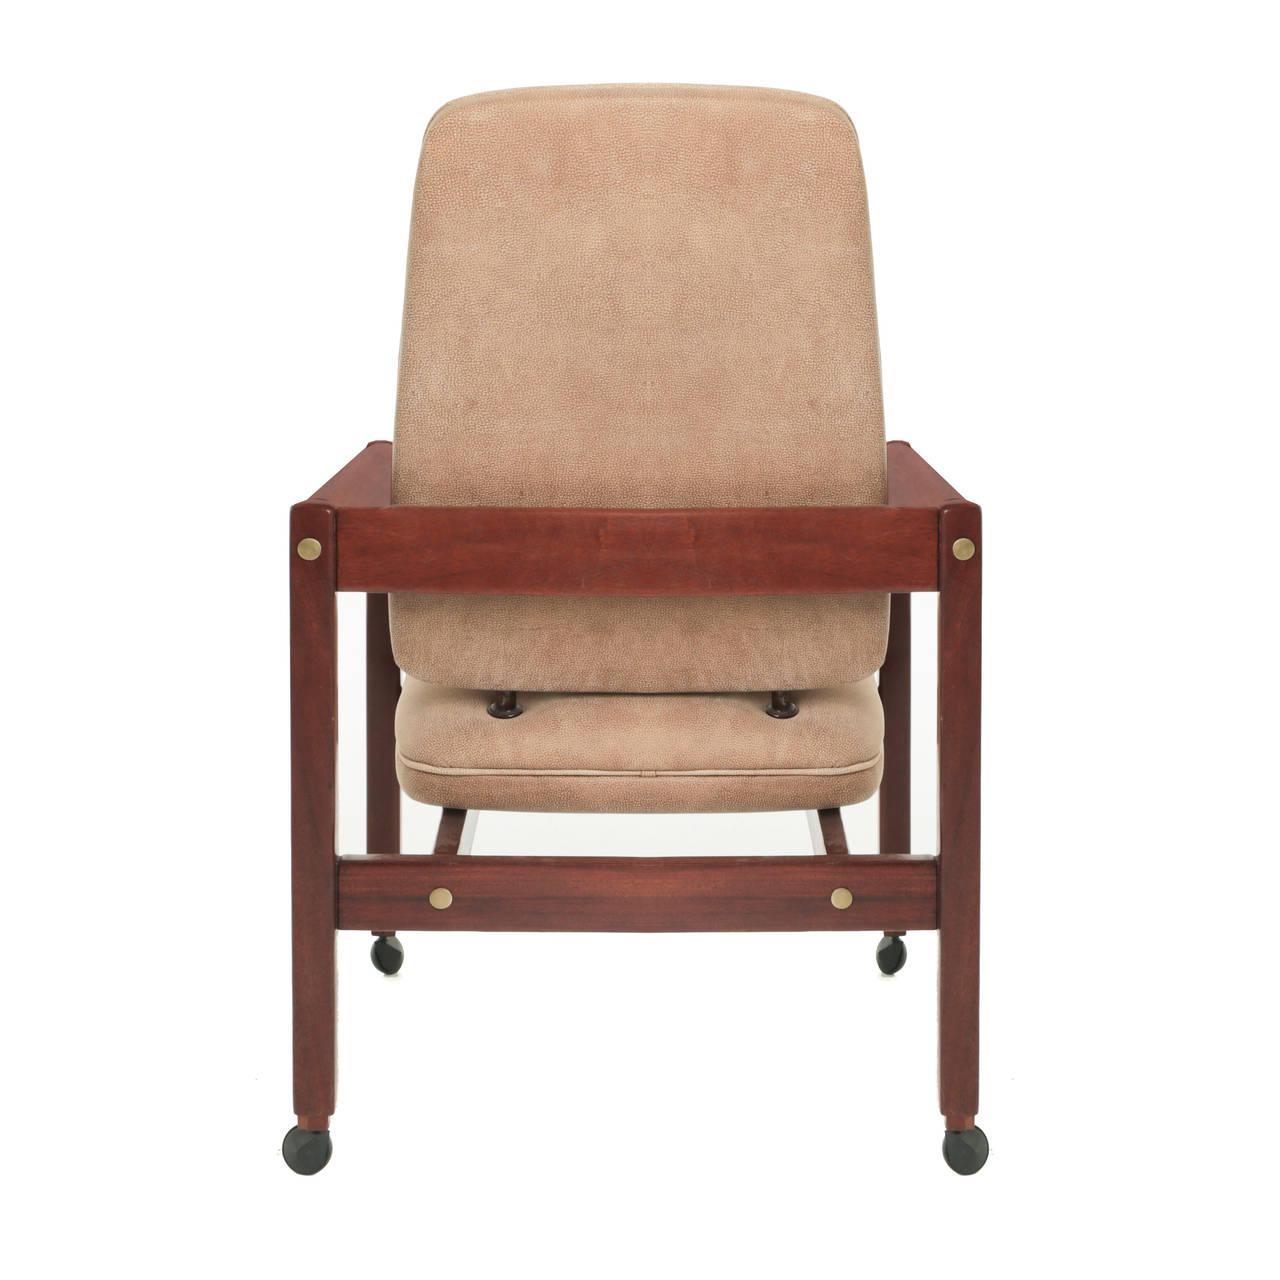 Mid-Century Modern Sergio Rodrigues  Kiko  Desk Chair - Image ...  sc 1 st  Chairish & Mid-Century Modern Sergio Rodrigues